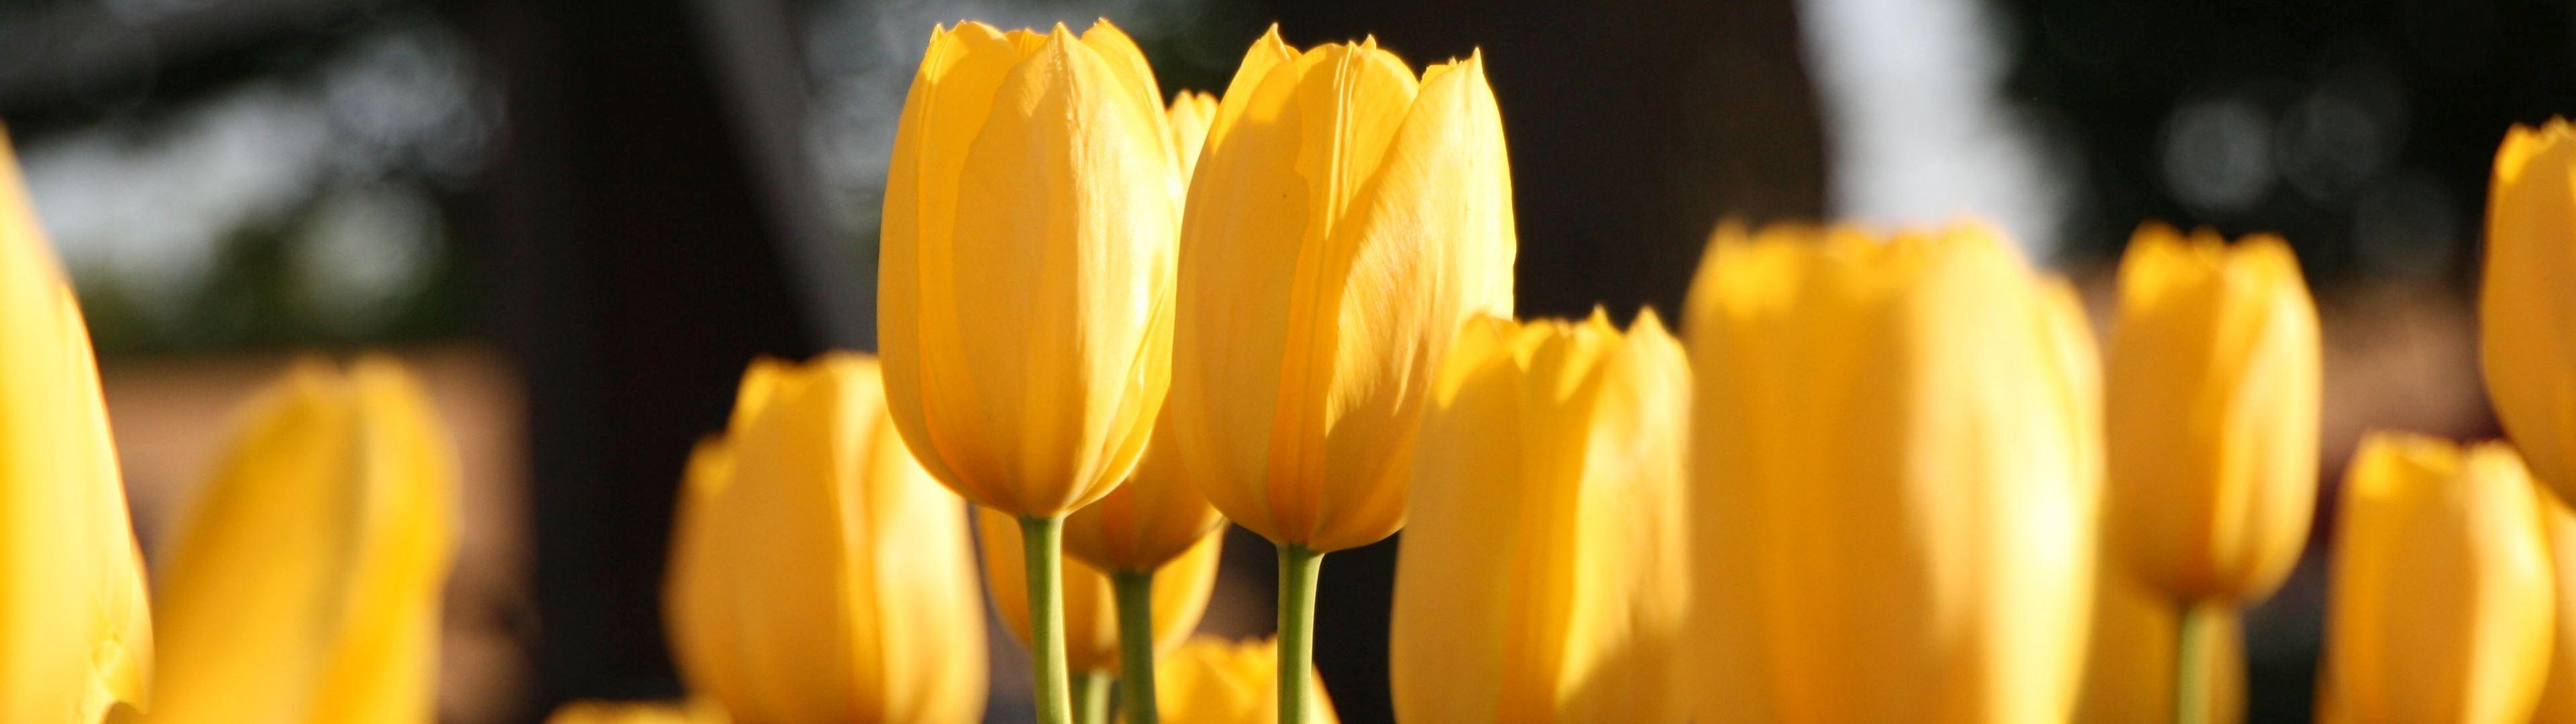 WallpaperFusion-octf-2009-yellow-tulips-and-windmill-Original-3888x2592.jpg